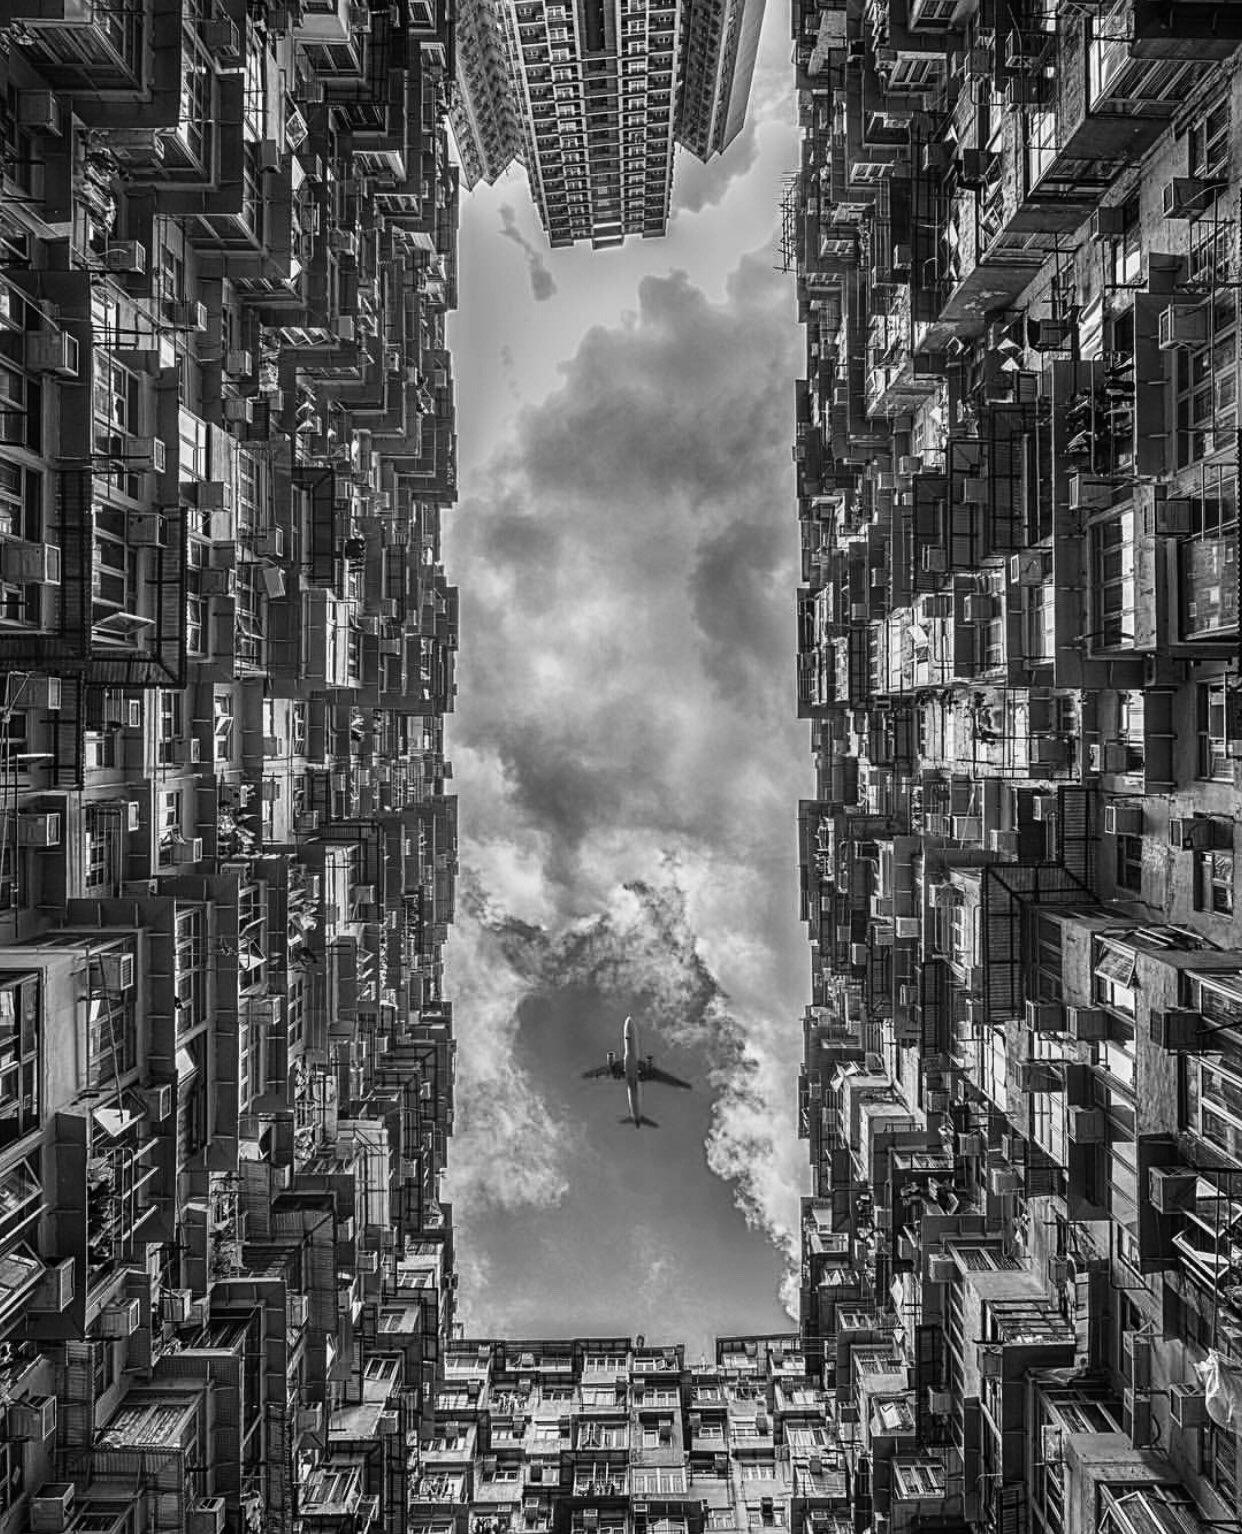 candid_street_photography_8.jpg